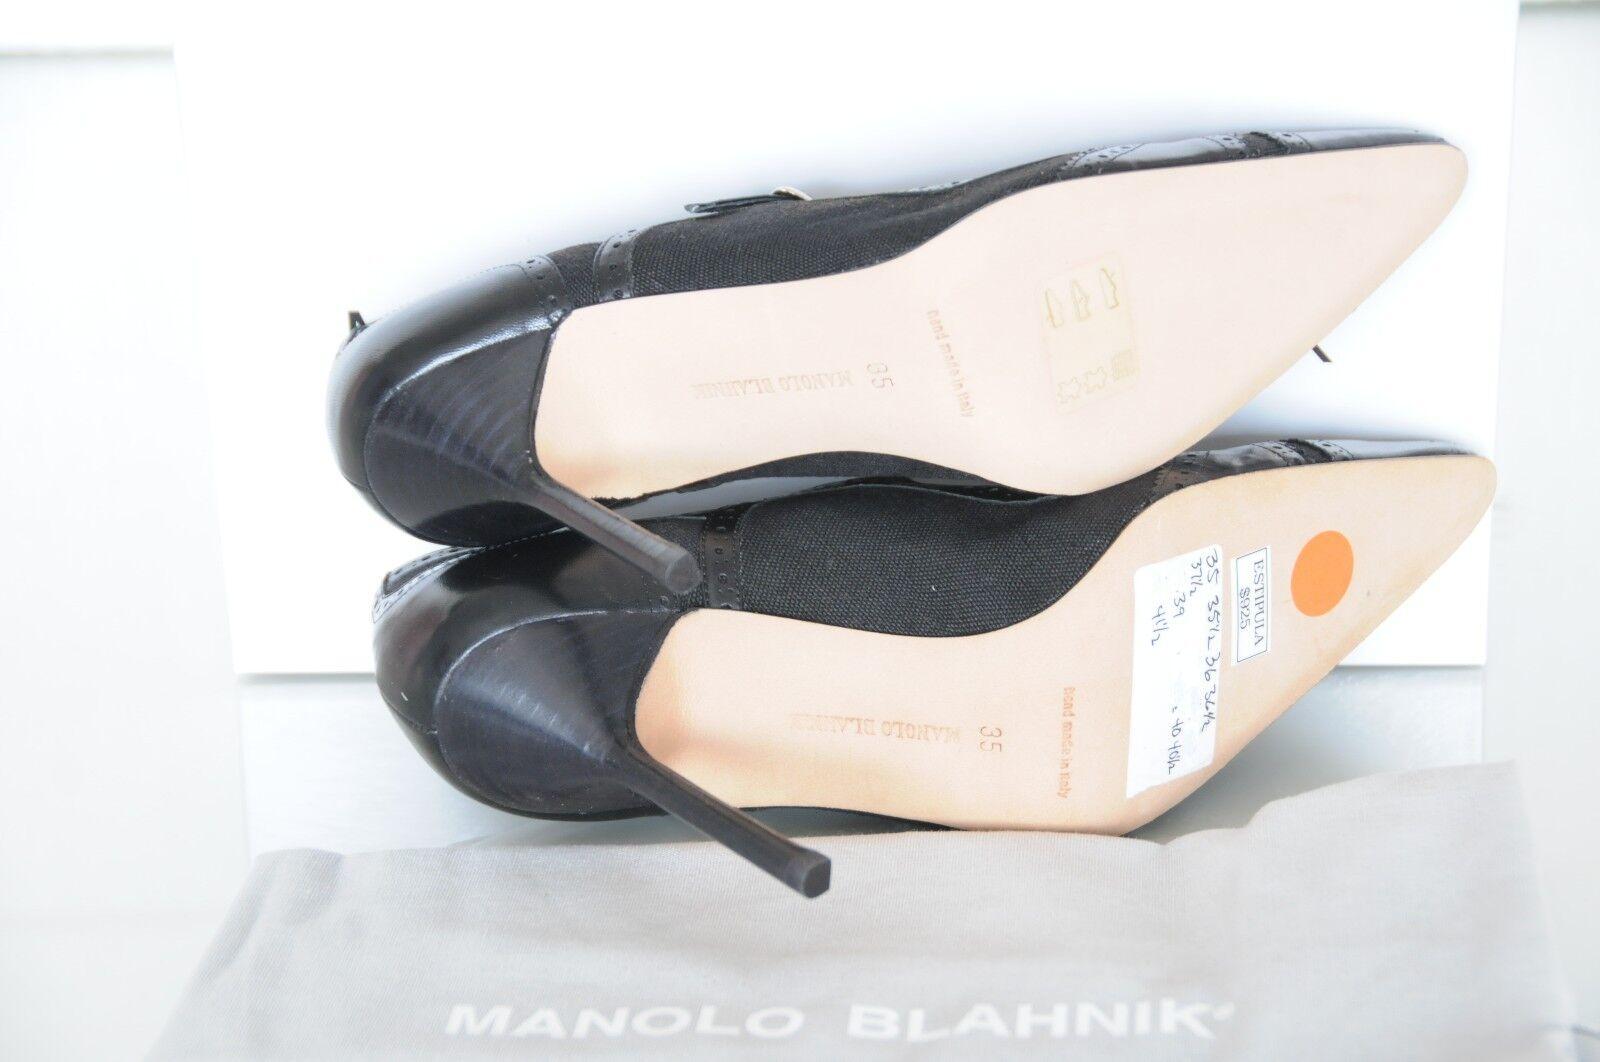 Neu Manolo Blahnik Bb Estipula Schwarz Mary Jane Pumps Pumps Pumps Schuhe 36.5 40.5 6 10 19b47d